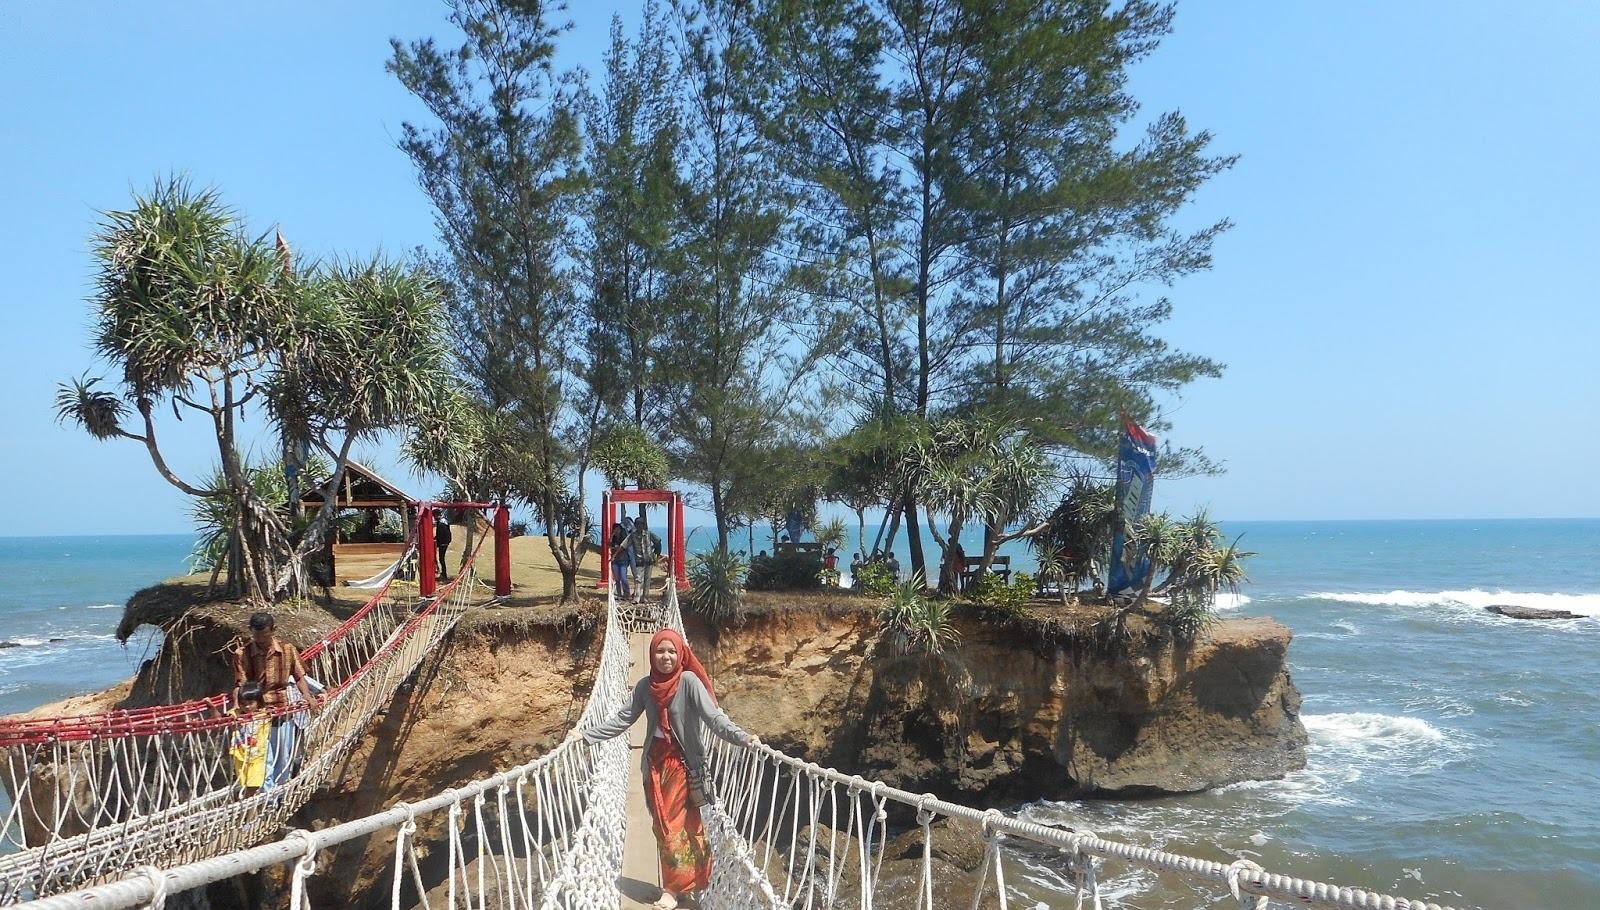 Bambang Purnomo Blog: Pesona Wisata Kota Bengkulu - Pantai ...